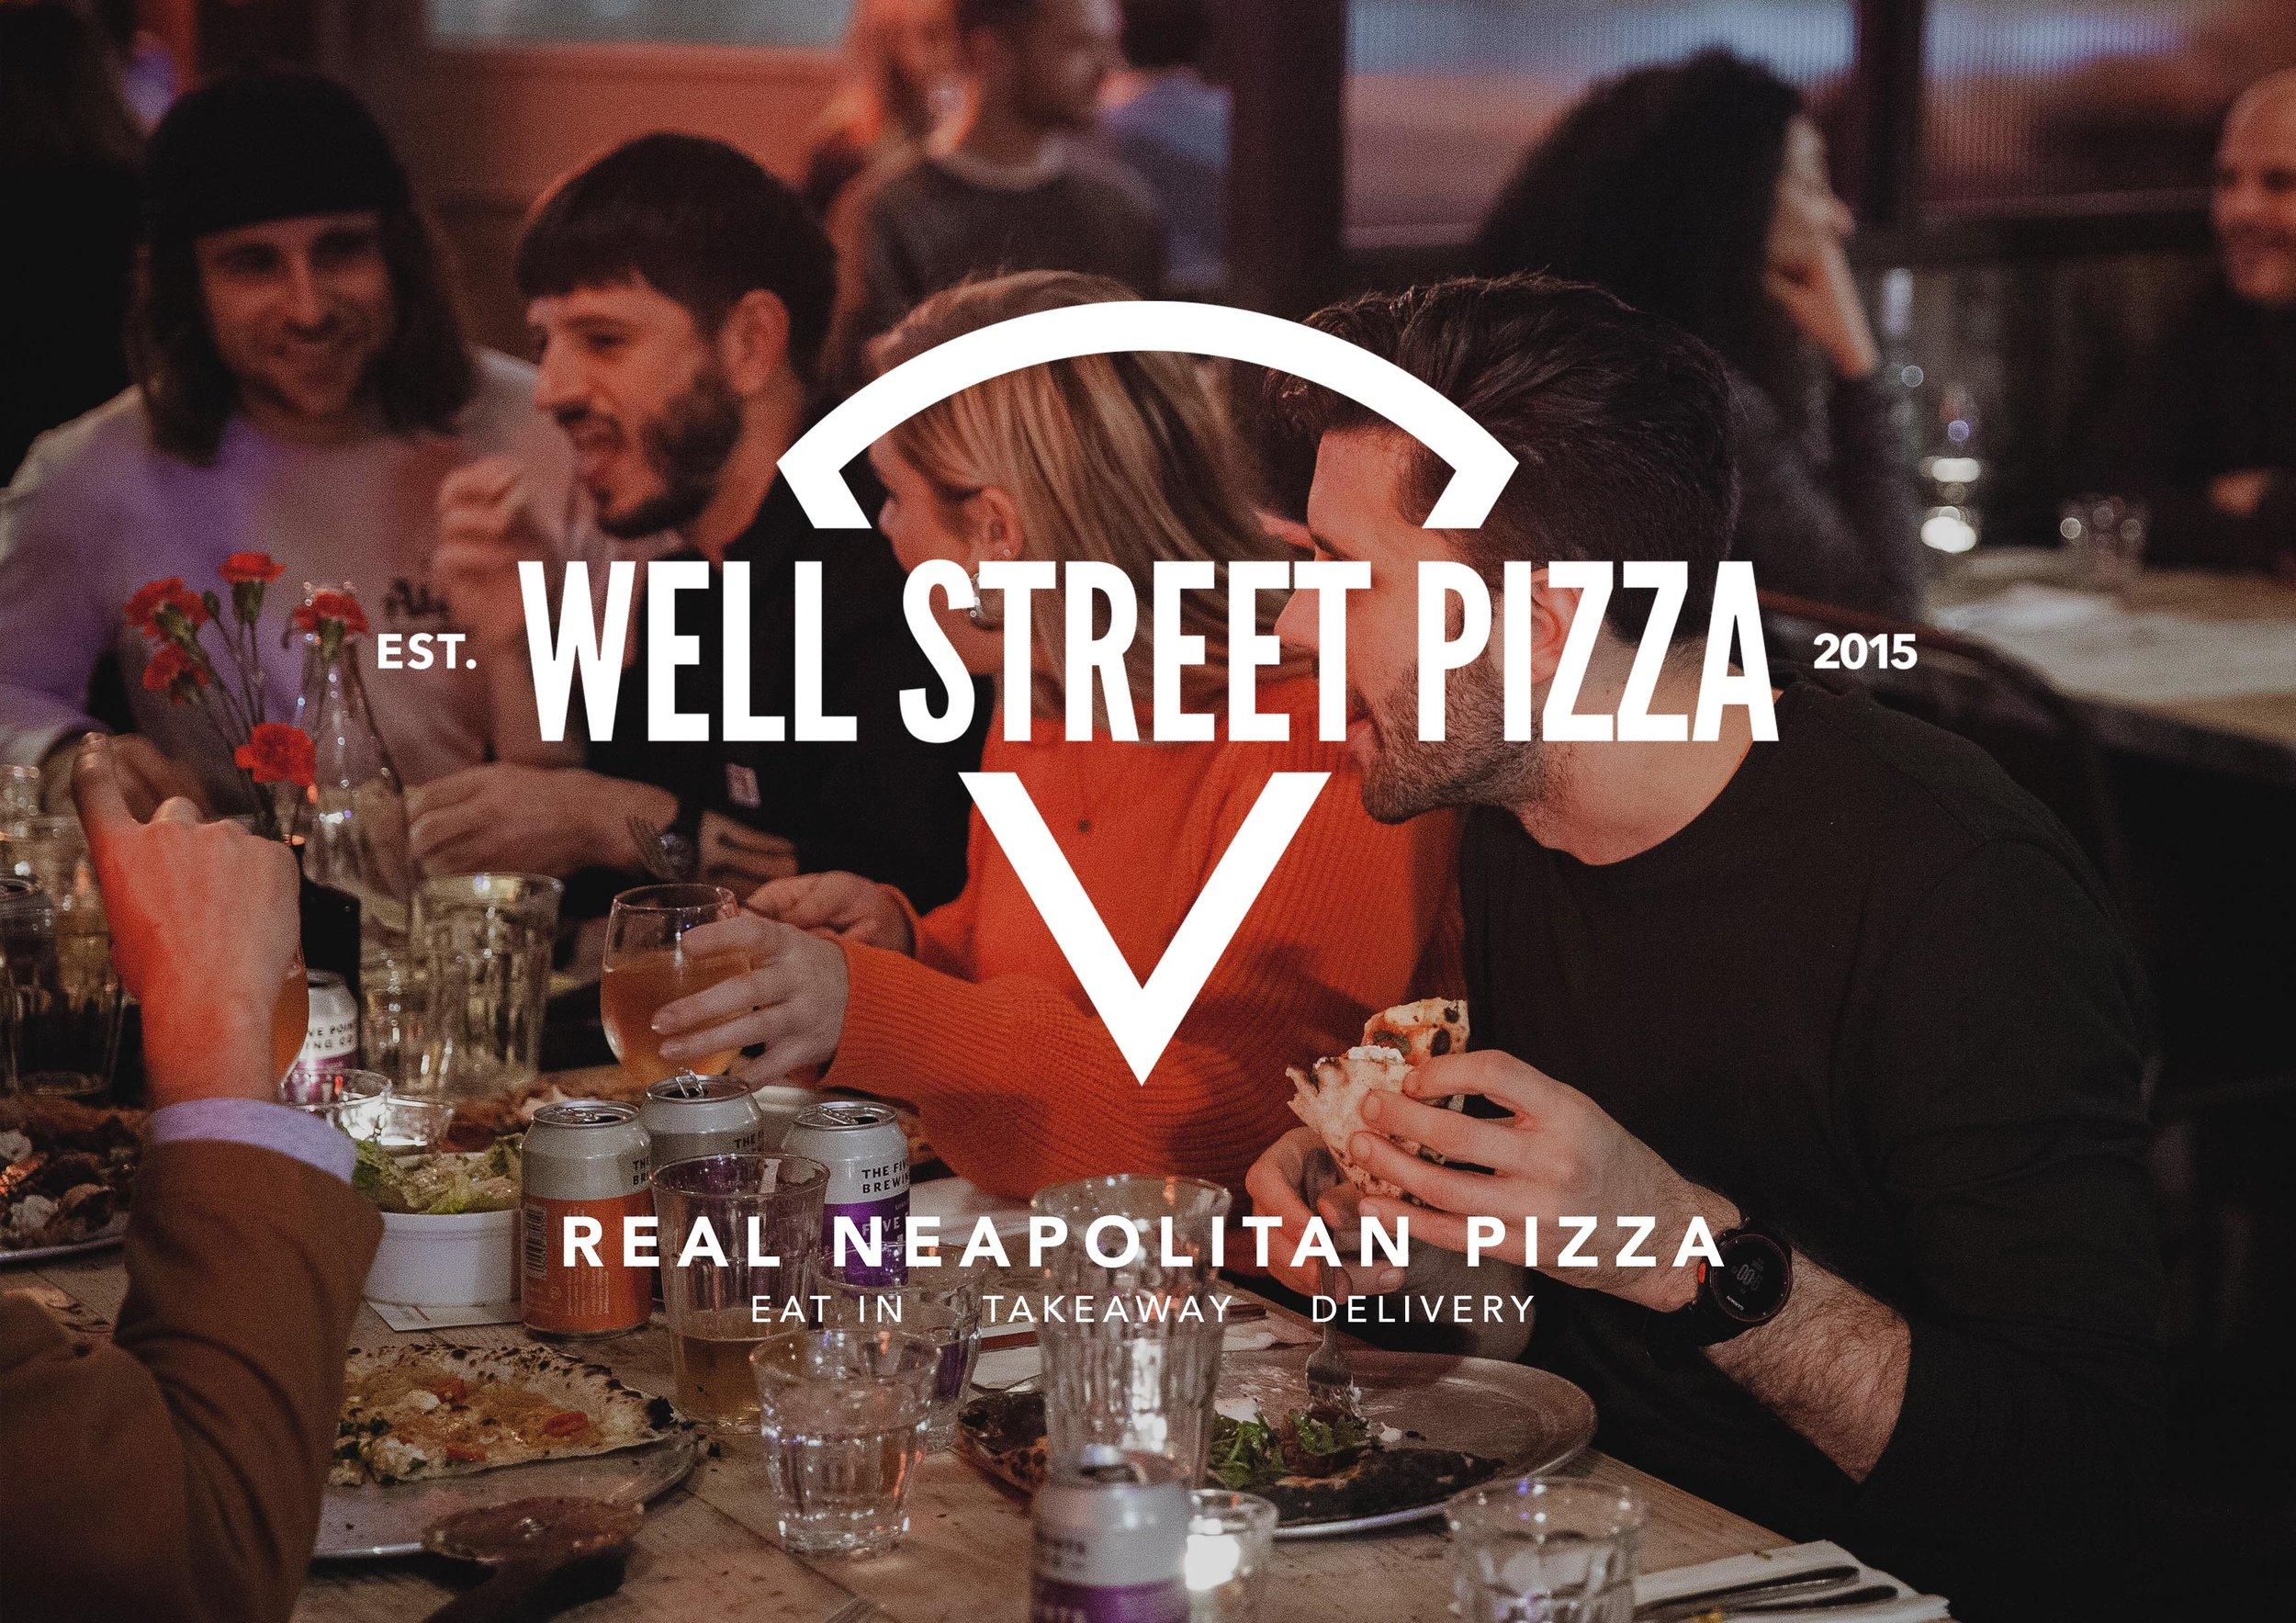 Well Street pizza Hackney